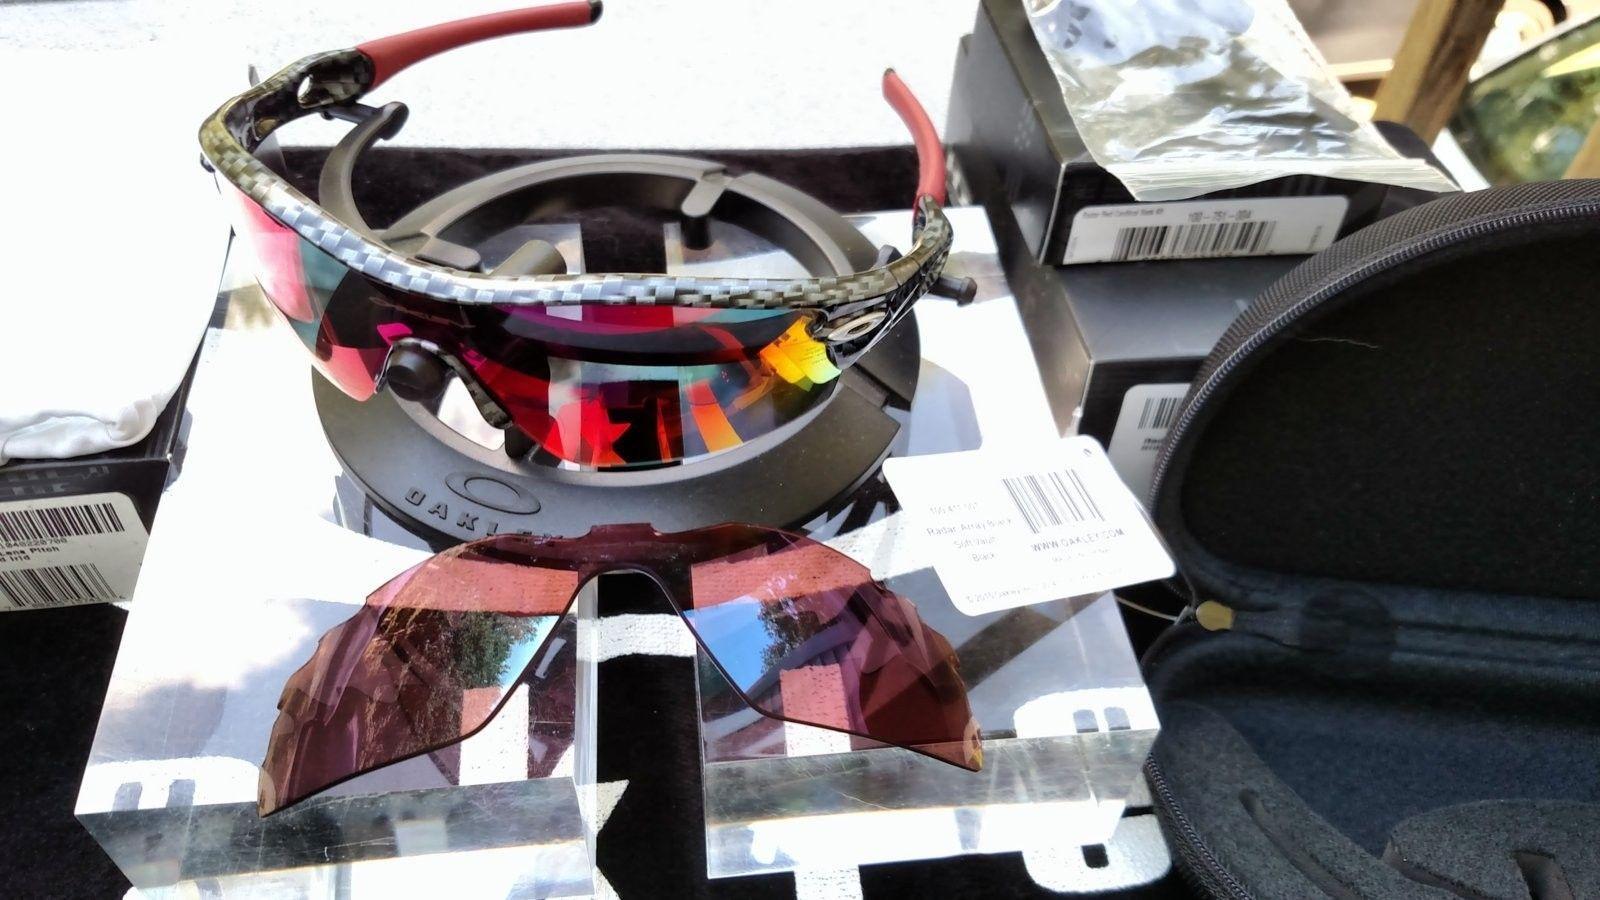 Sweet / New Radar Pitch Array - Homemade with pride! - IMG_20160805_161759895.jpg